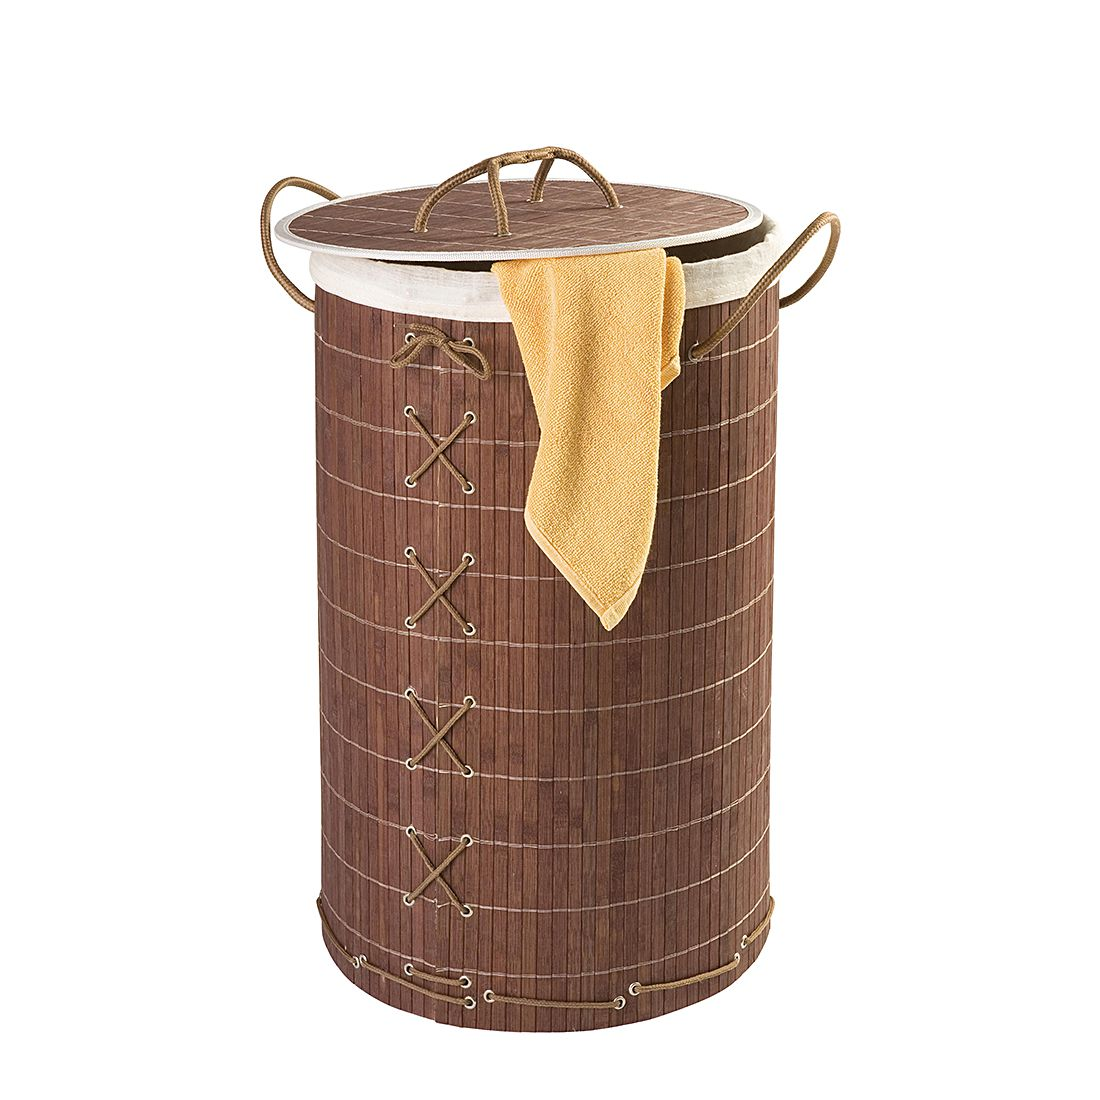 Wäschetruhe Bamboo - Dunkelbraun, Wenko